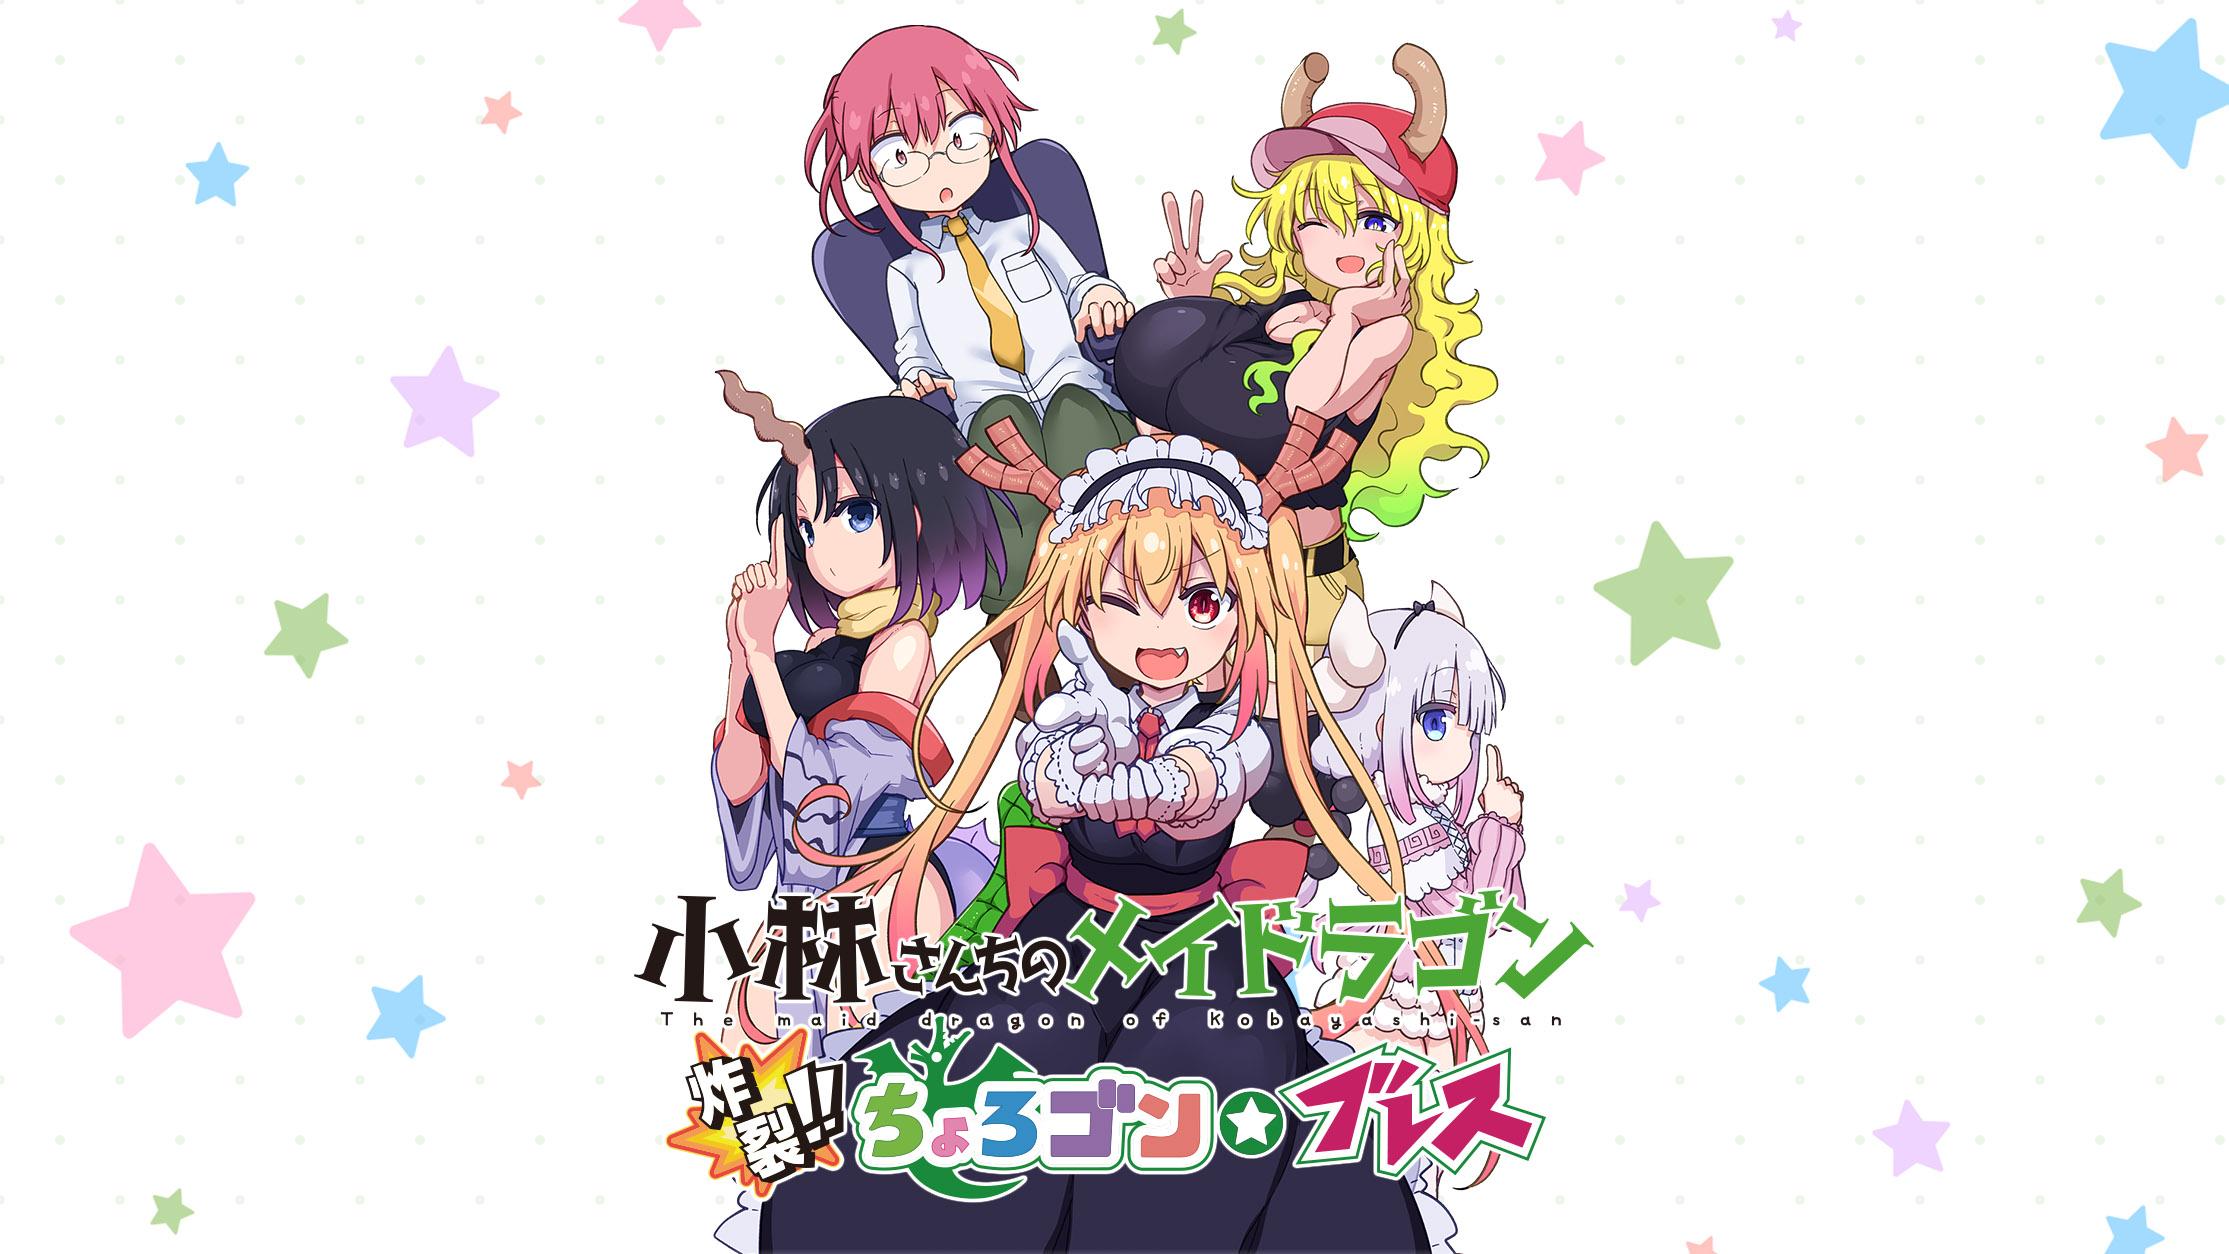 Přehled novinek z Japonska 38. týdne Kobayashi Dragon Maid Game 09 22 21